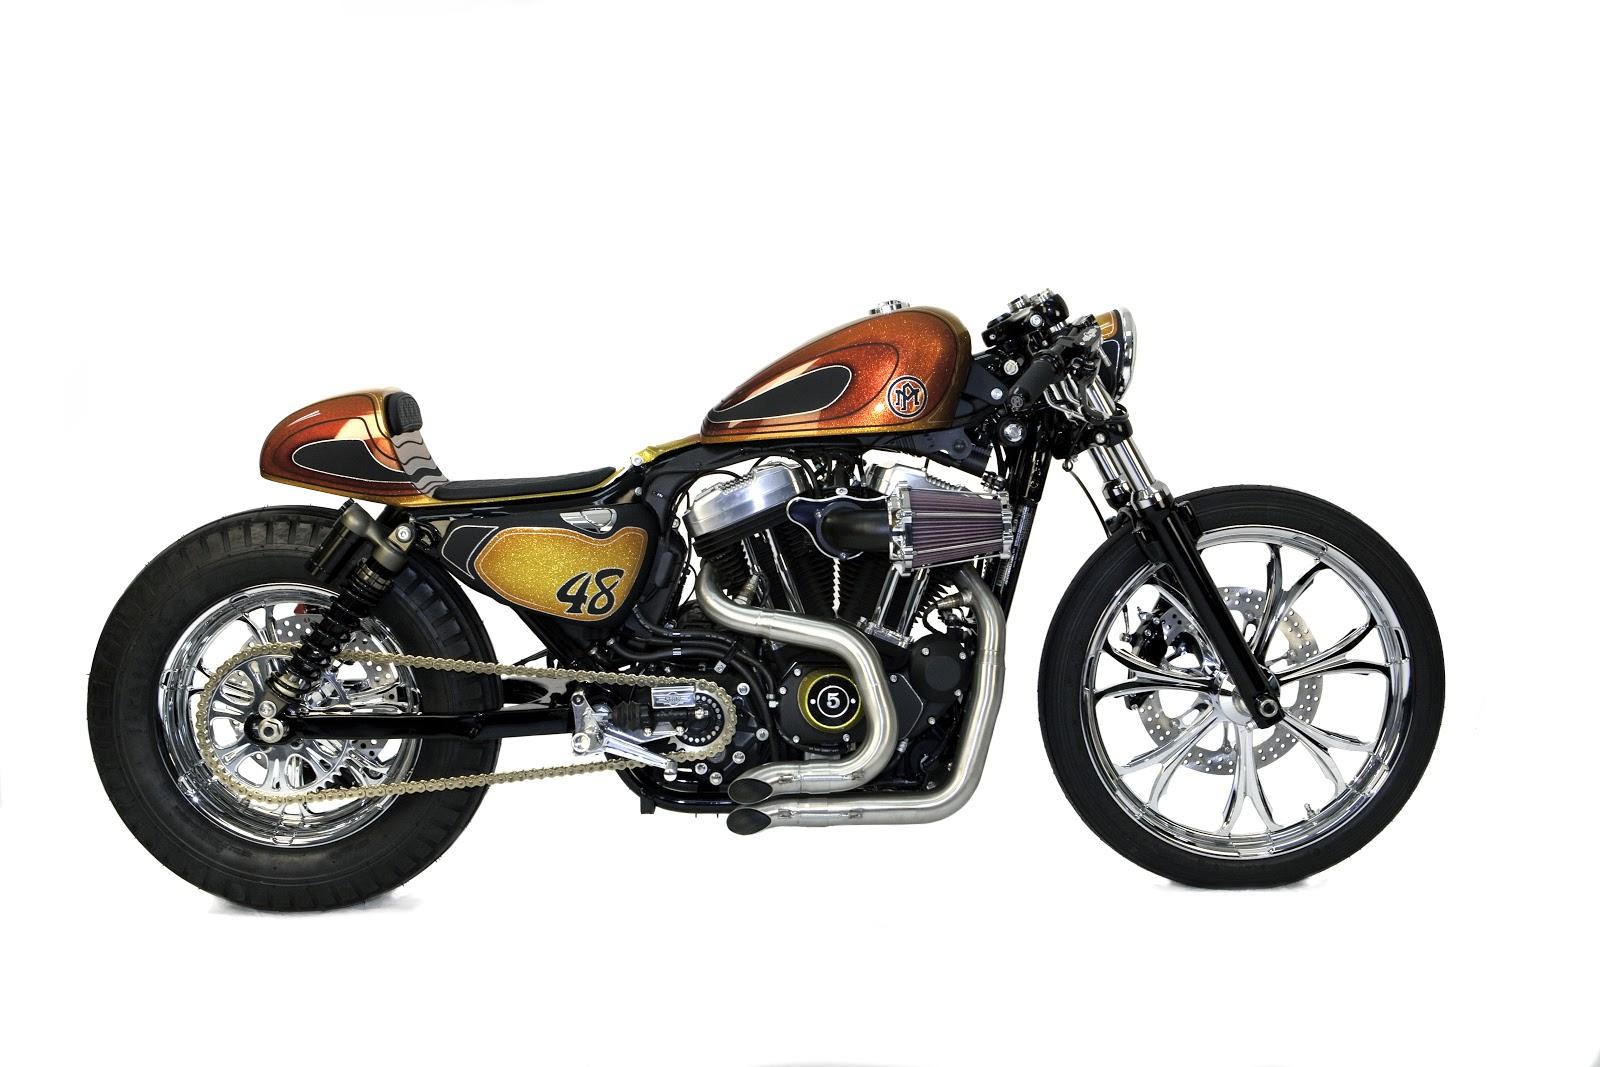 Racing Caf U00e8  Harley Sportster  U0026quot 48 U0026quot  By Performance Machine